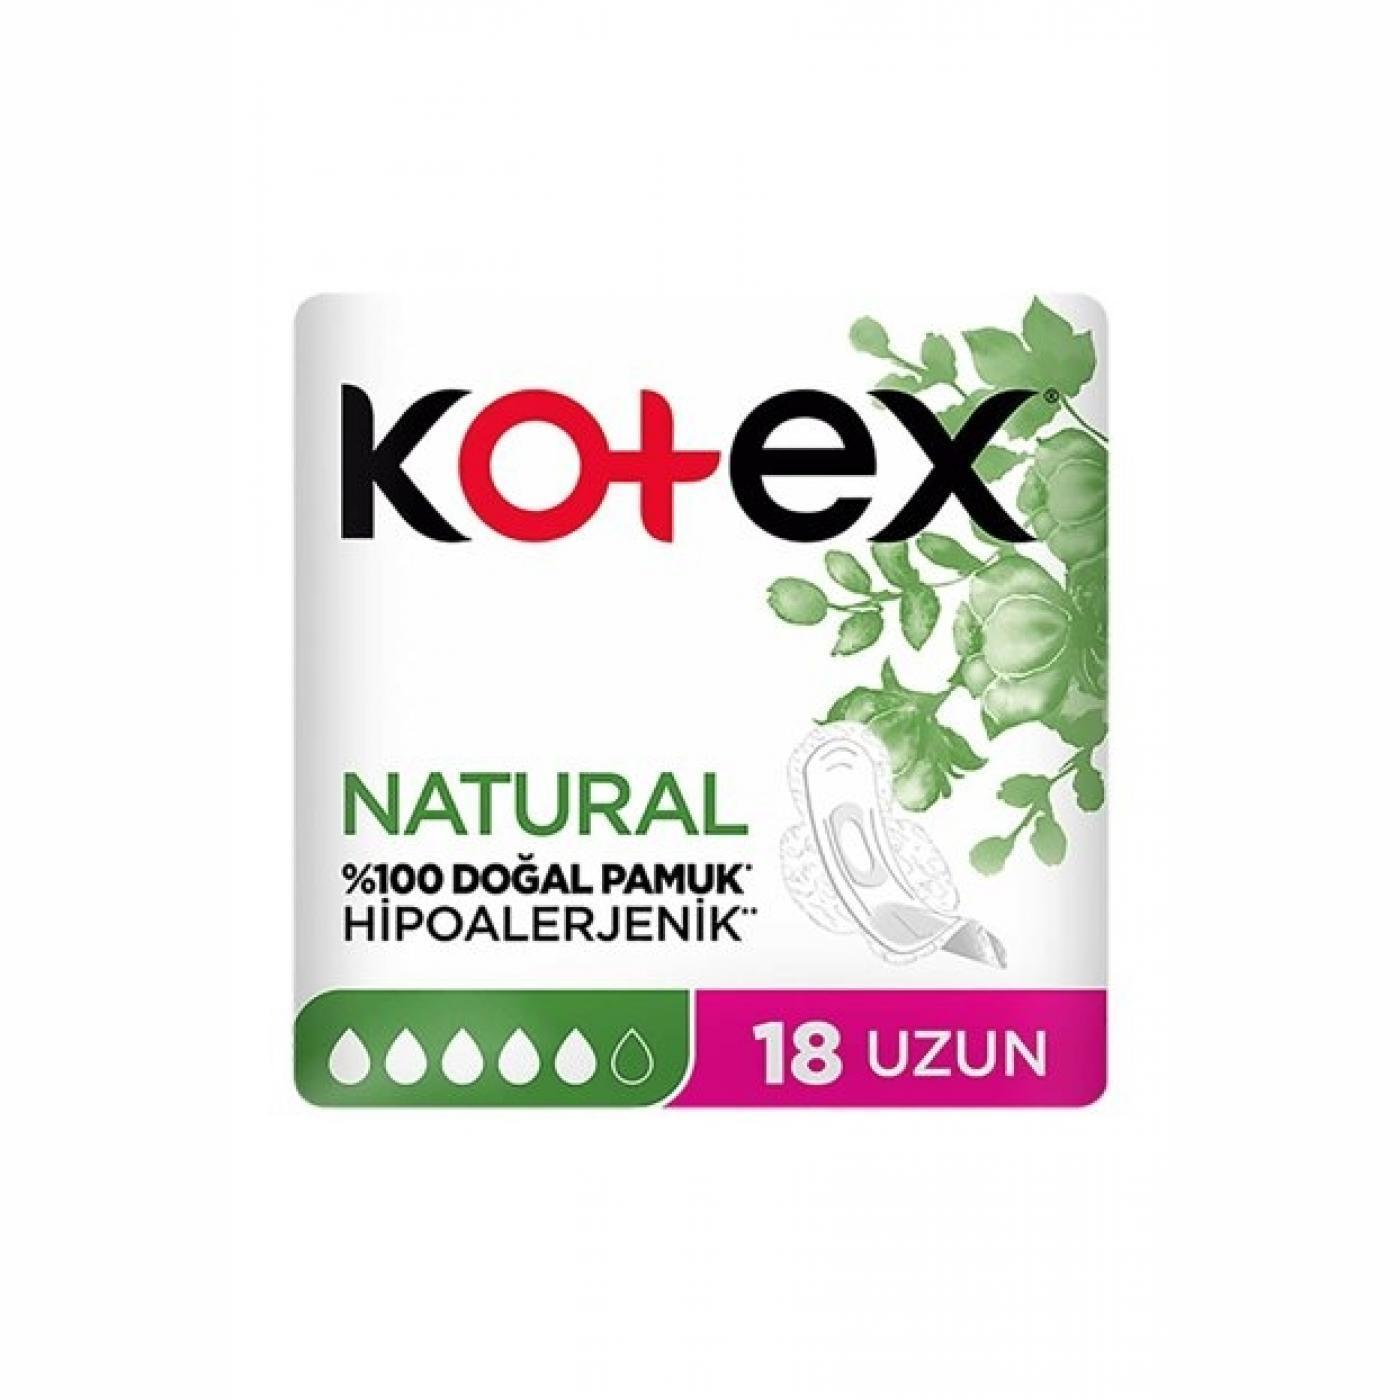 KOTEX NATURAL ULTRA UZUN 18Lİ